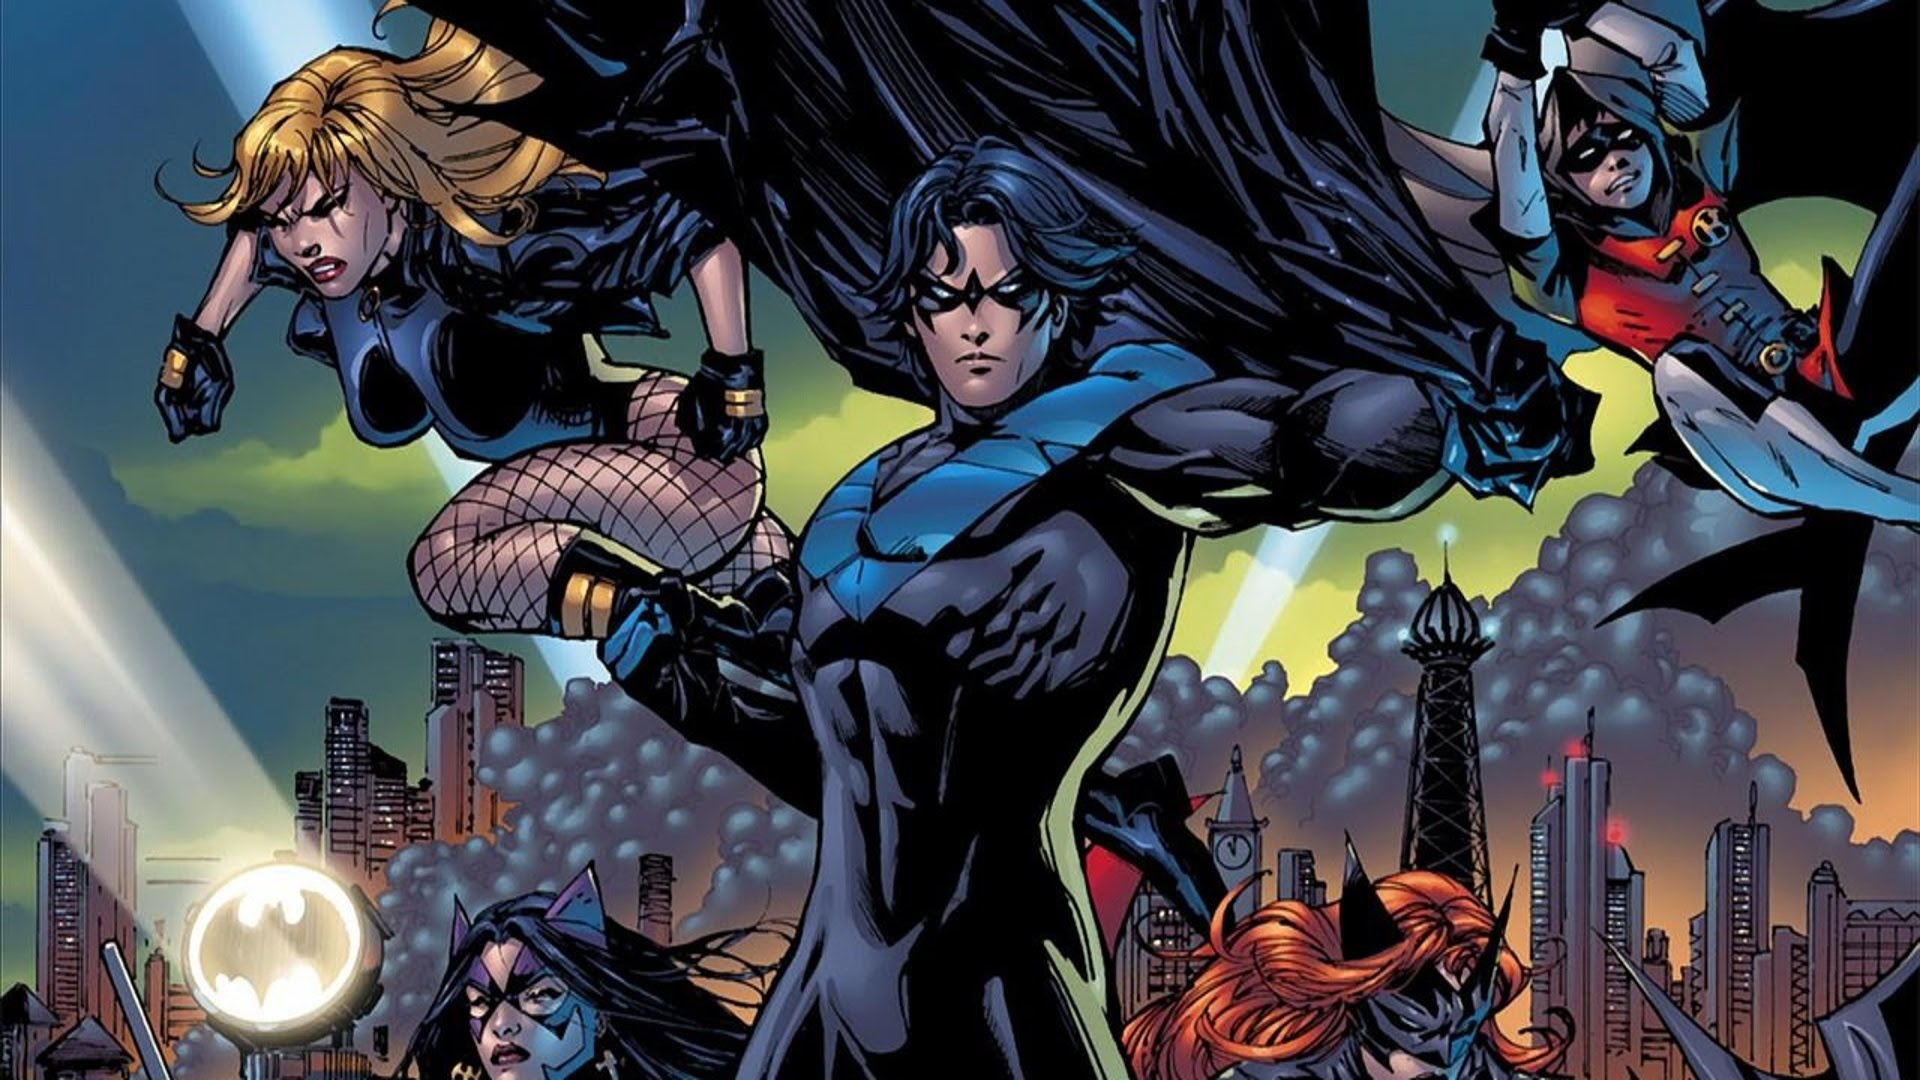 1920x1080 > Batman: Battle For The Cowl Wallpapers